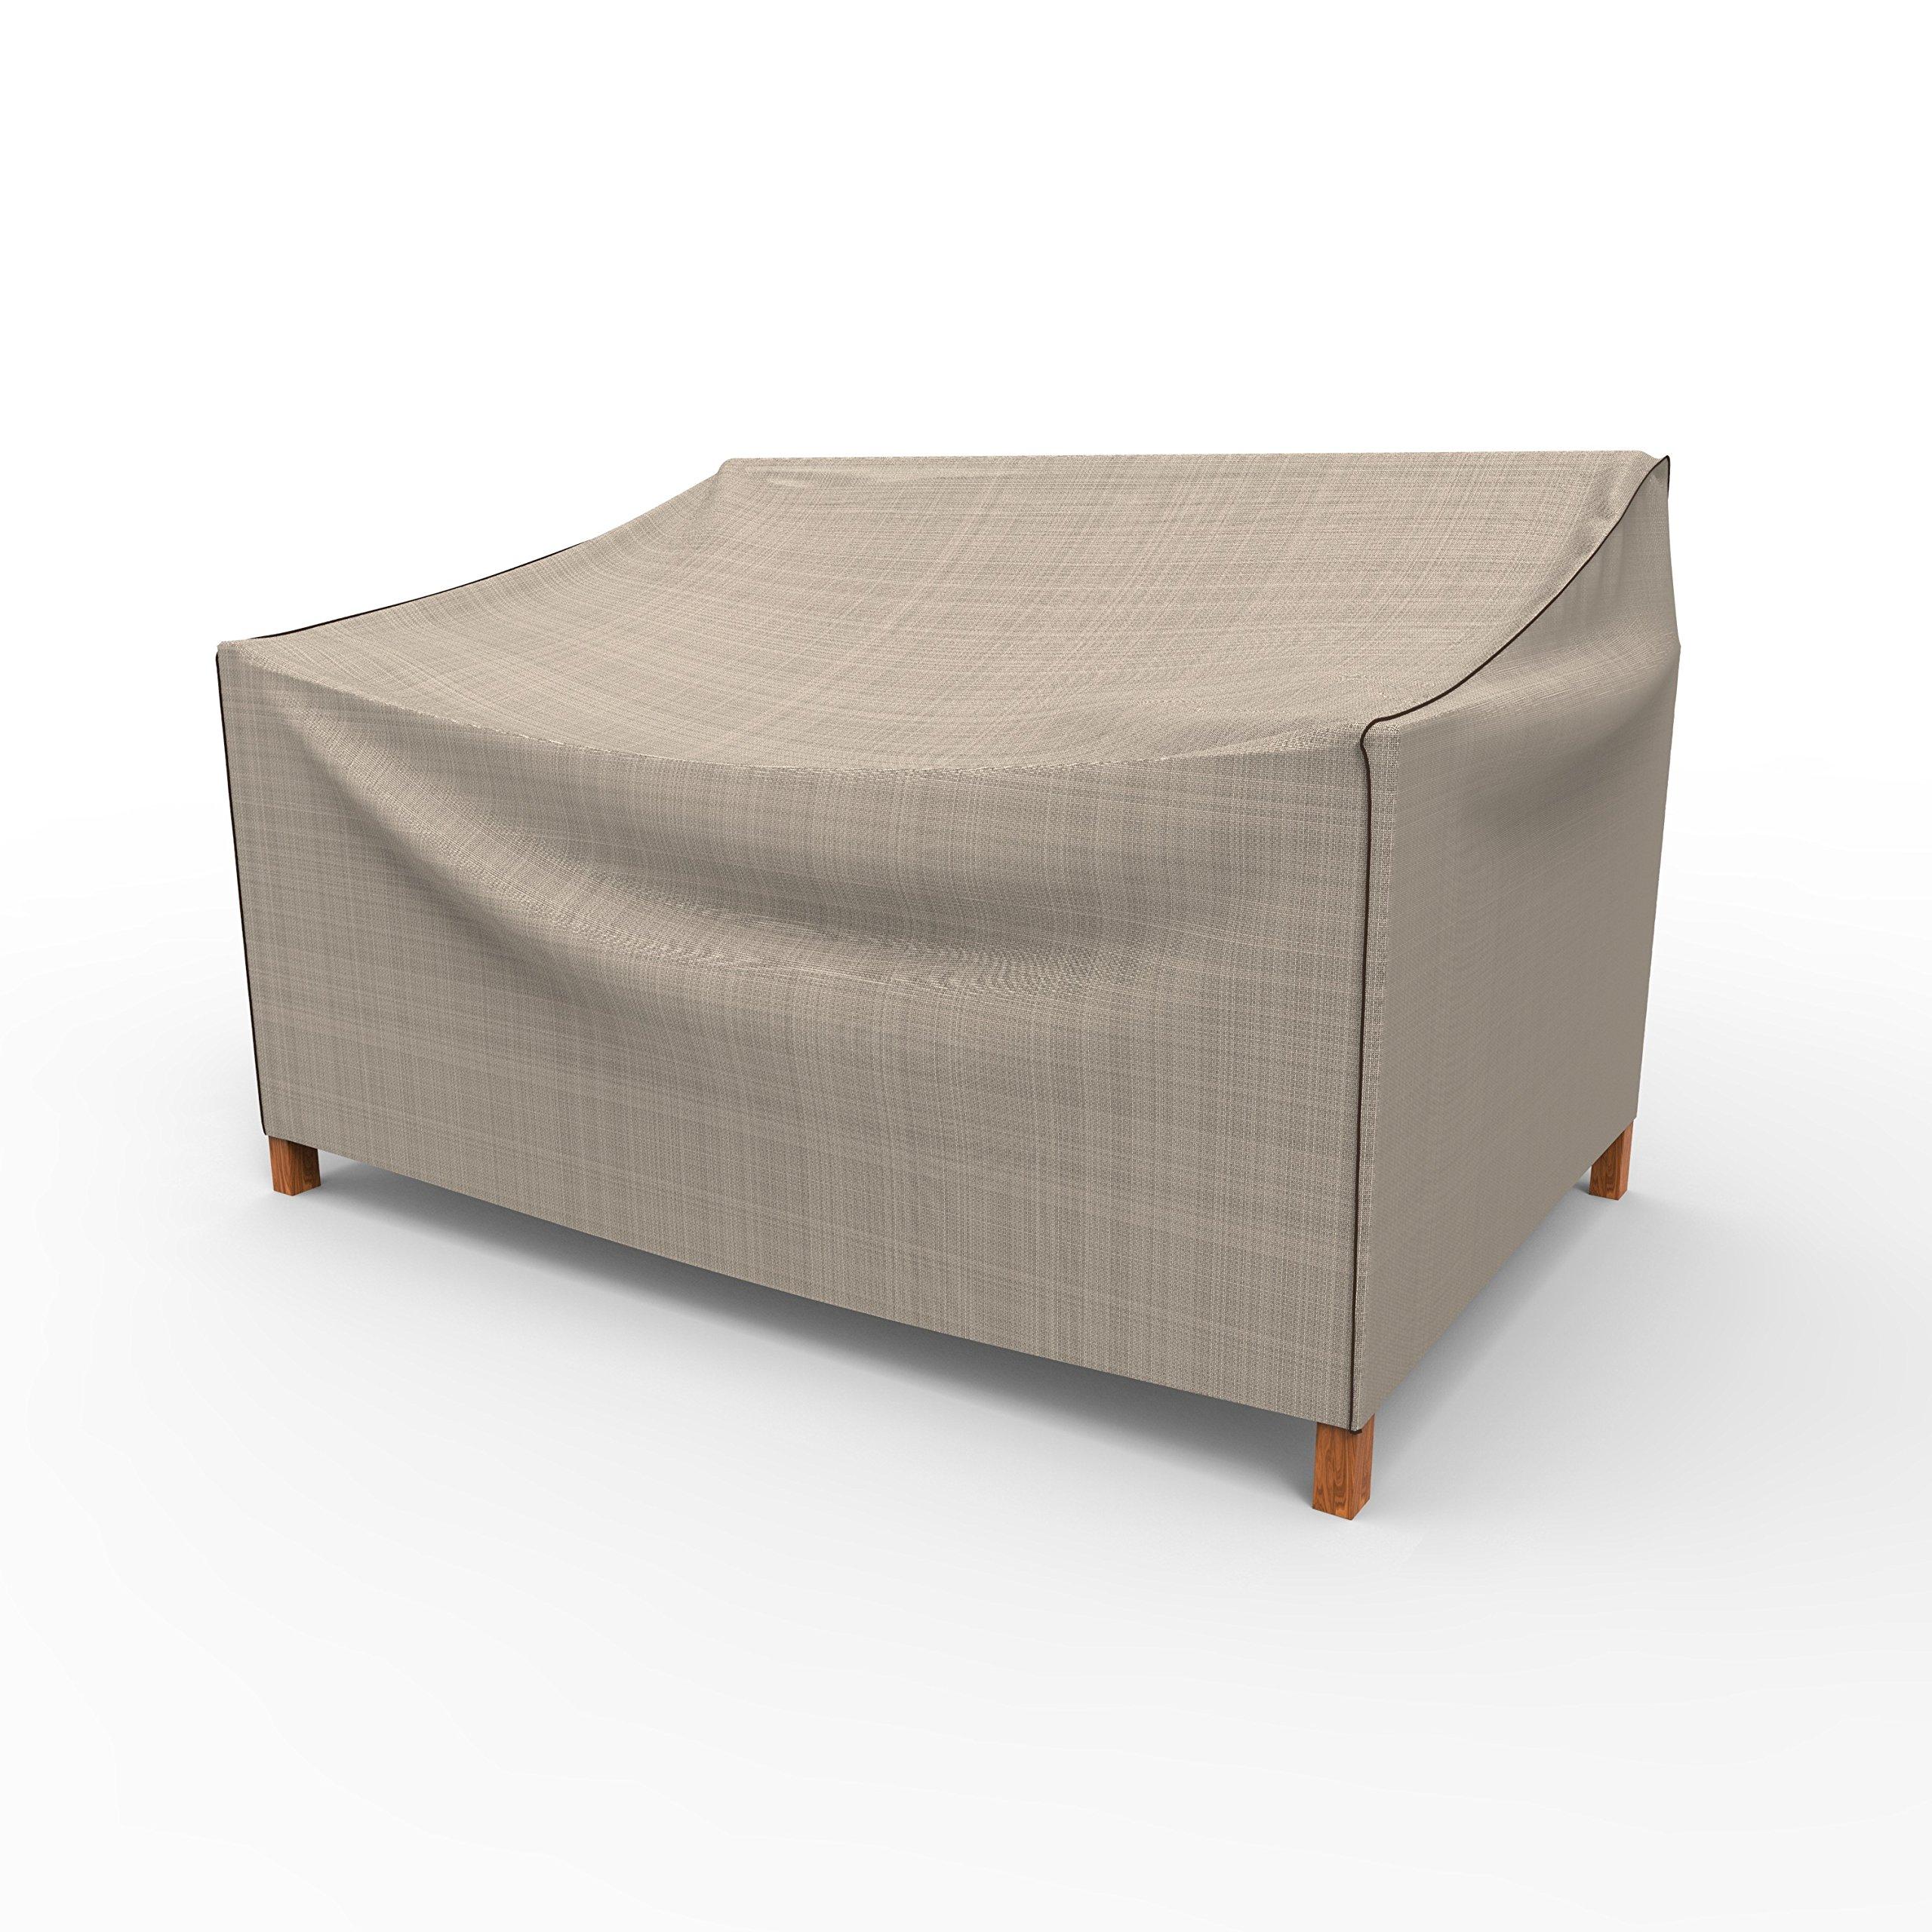 EmpirePatio P3A03PM1 Tan Tweed Glider Cover